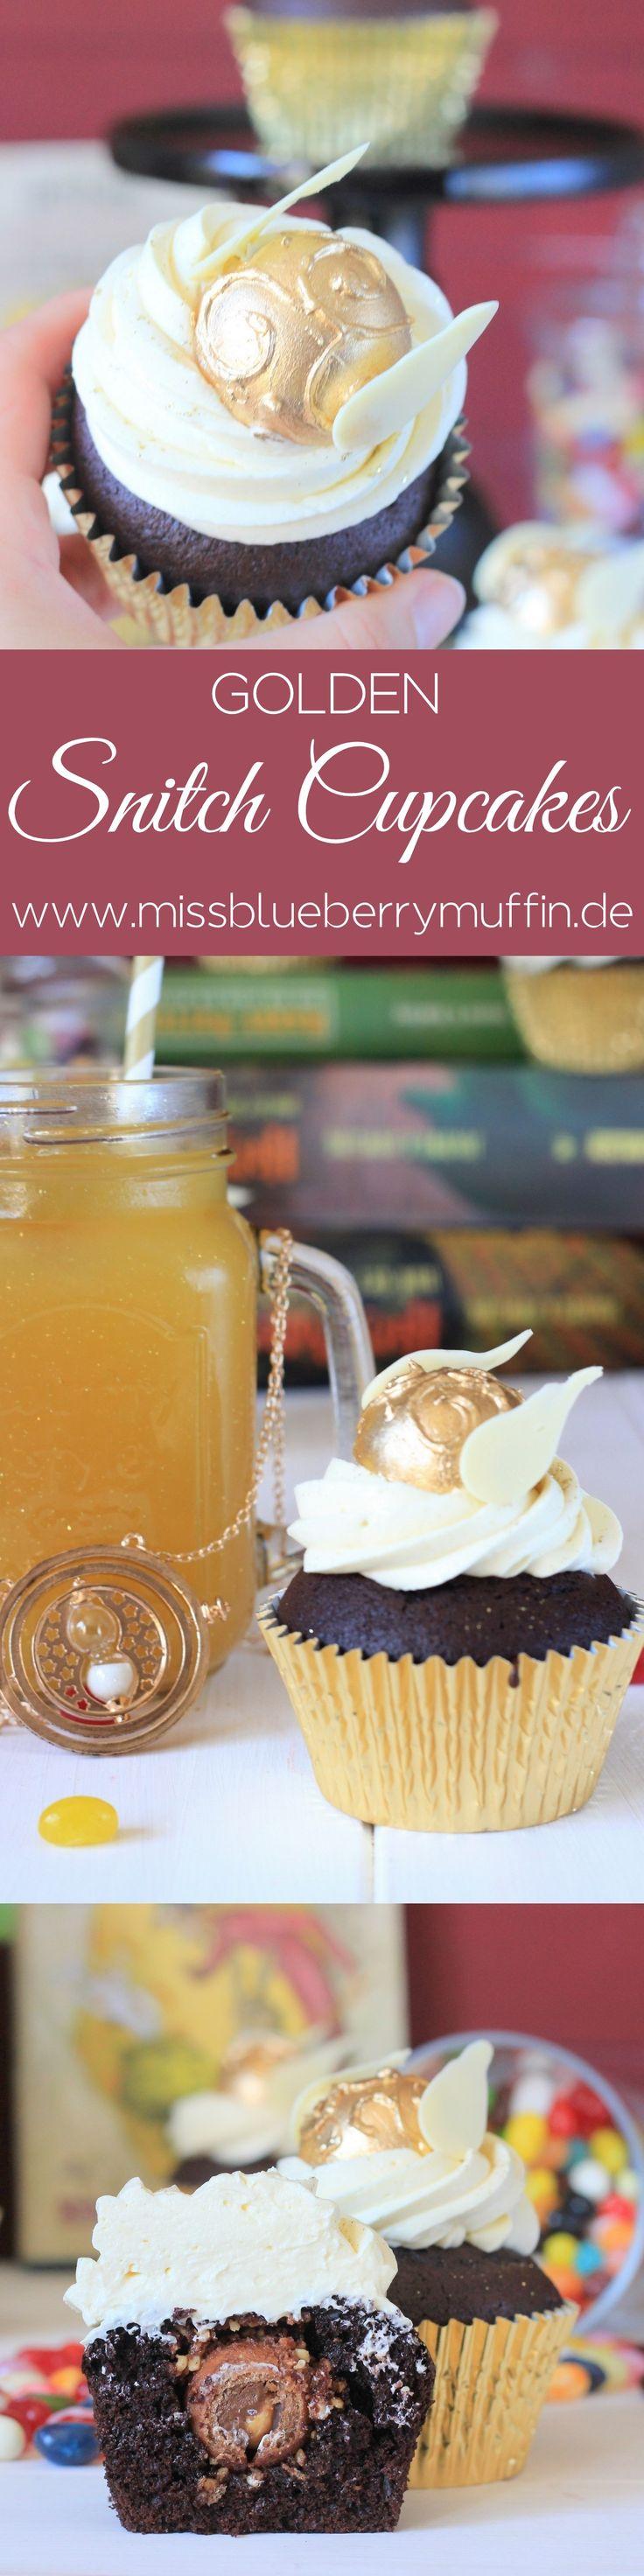 Harry Potter Cupcakes mit dem goldenen Schnatz // Golden Snitch Cupcakes from Hogwarts <3